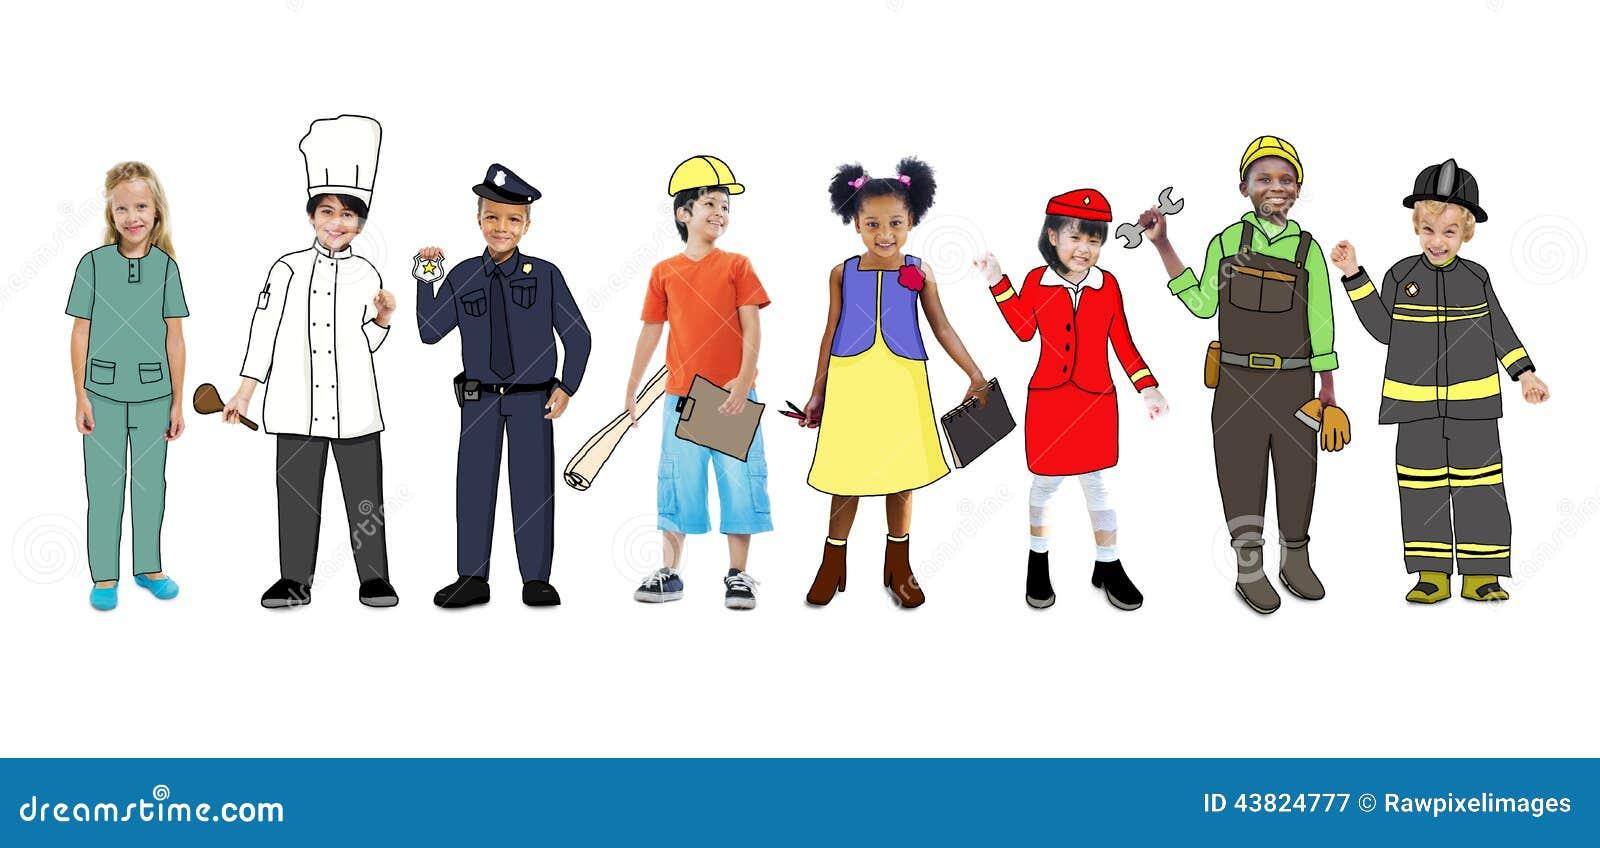 Art Jobs : Children wearing dream job uniforms stock illustration